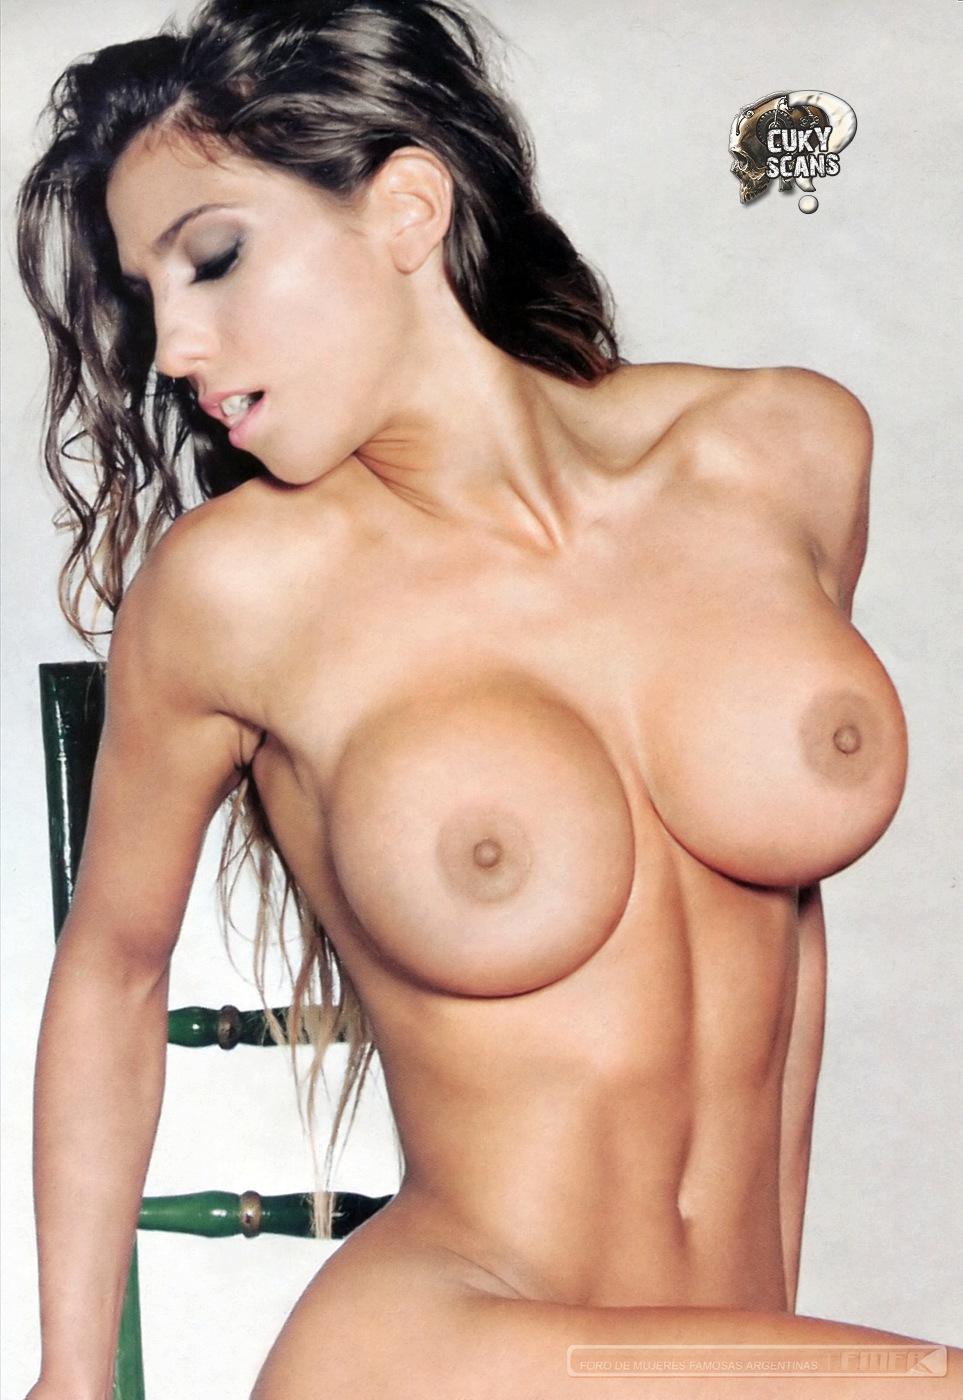 image Maria la culona de francfort am main germany breite gasse